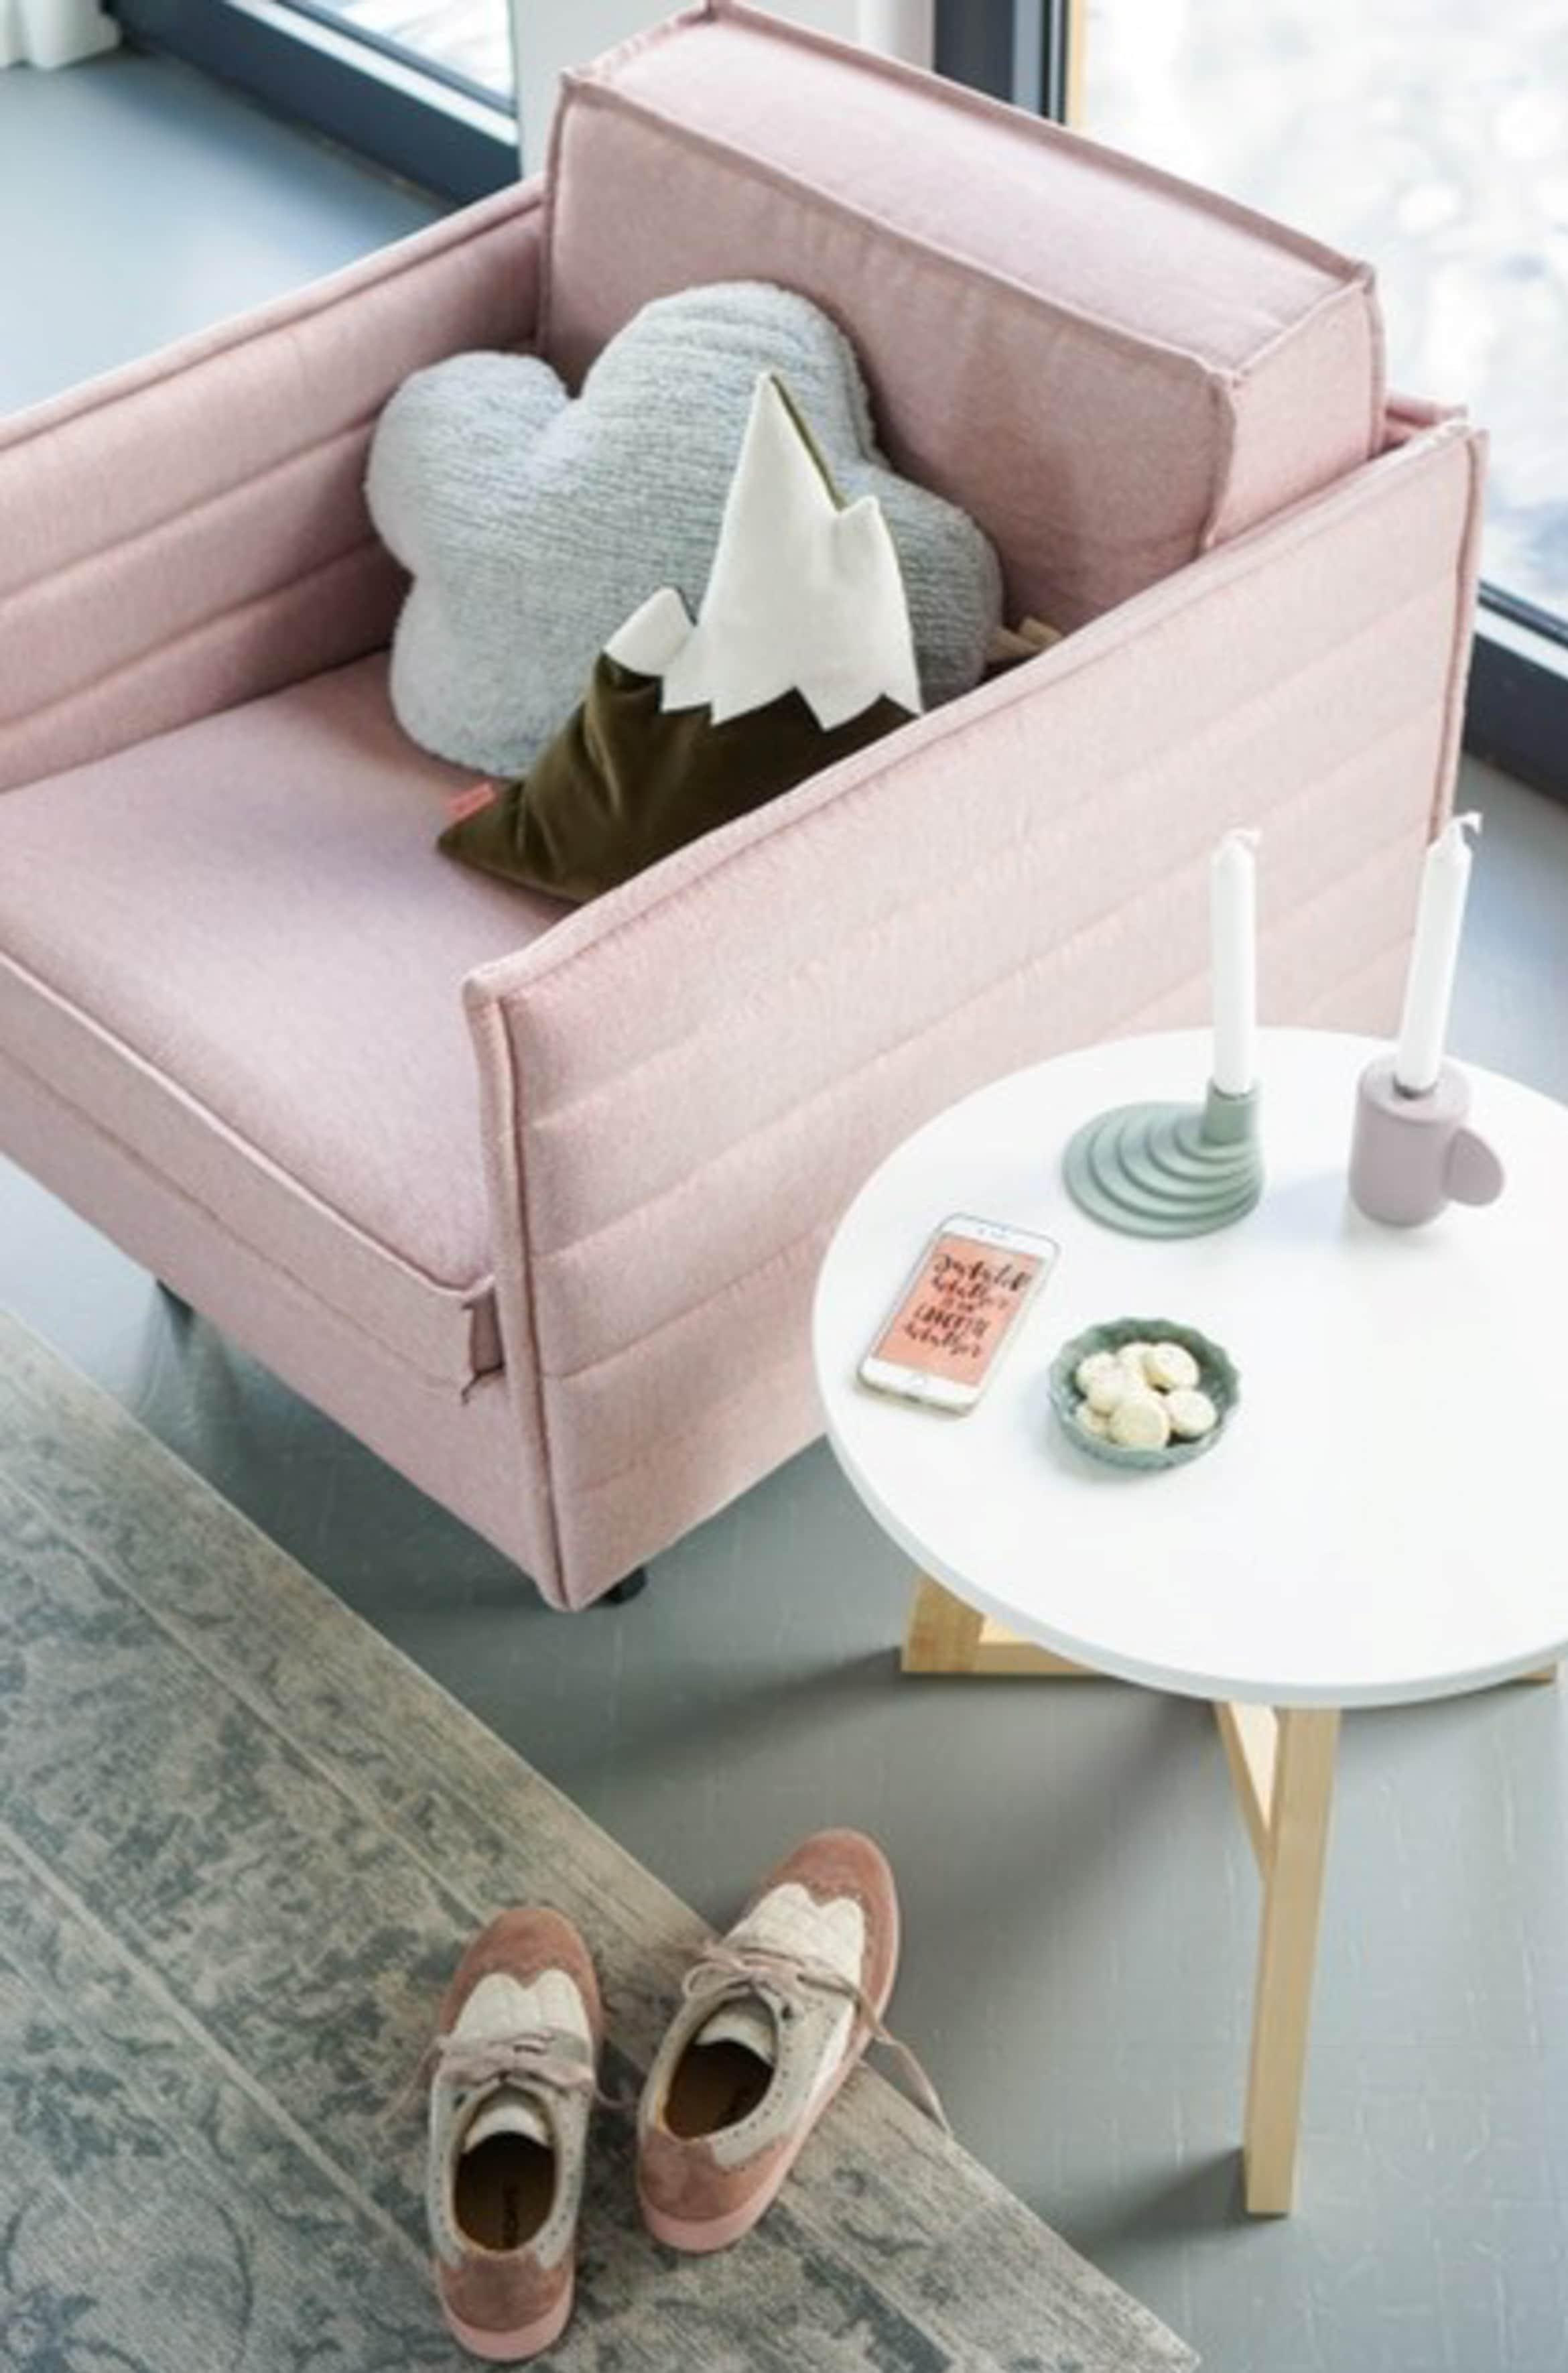 wehkamp roze stoel